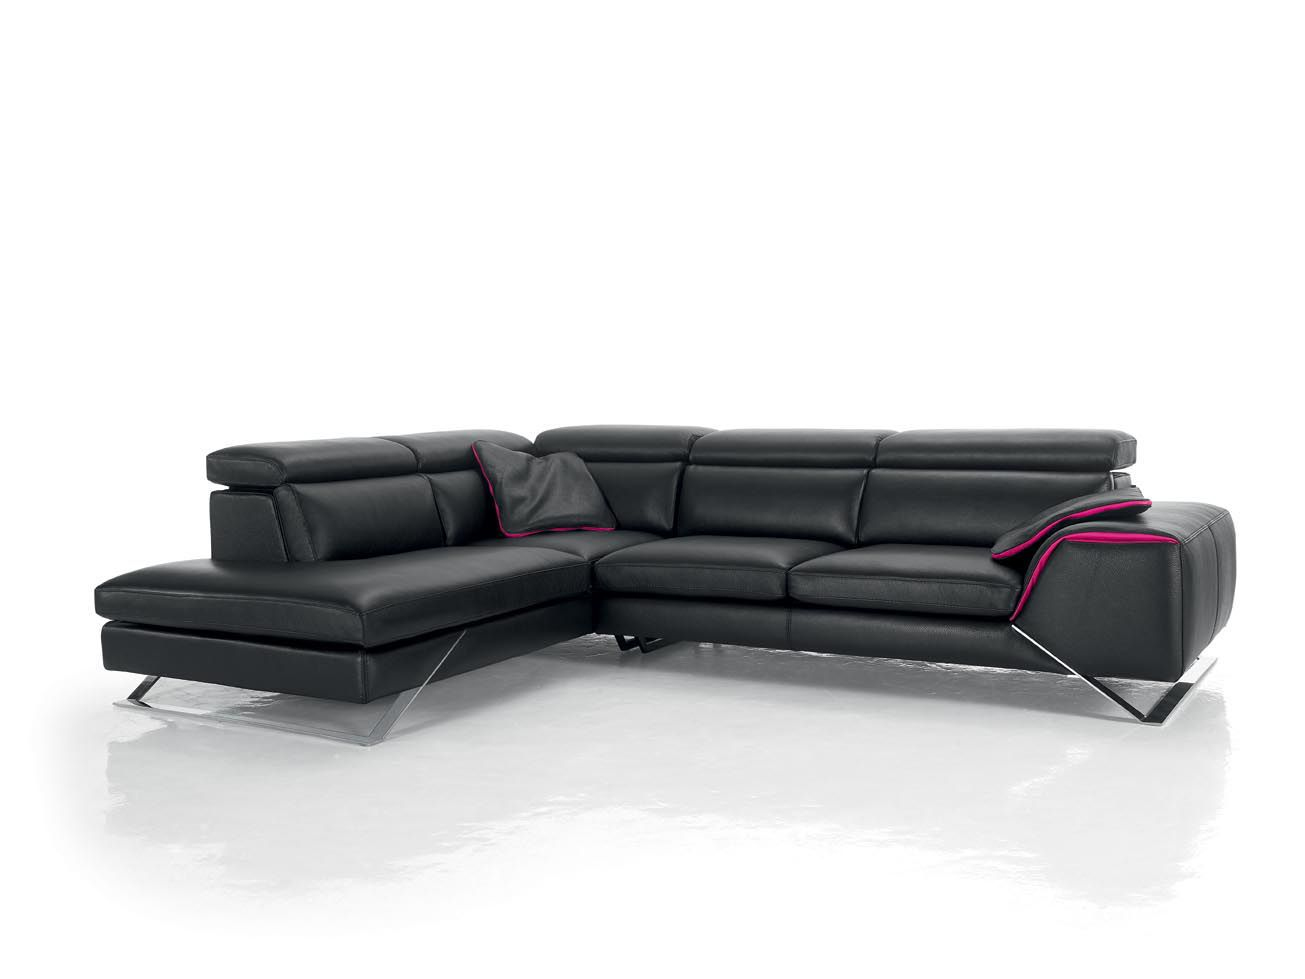 Canapé Roche Bobois Prix Usine Beau Images Canap Italien sofa Stunning Canap Design Italien with Canap Italien